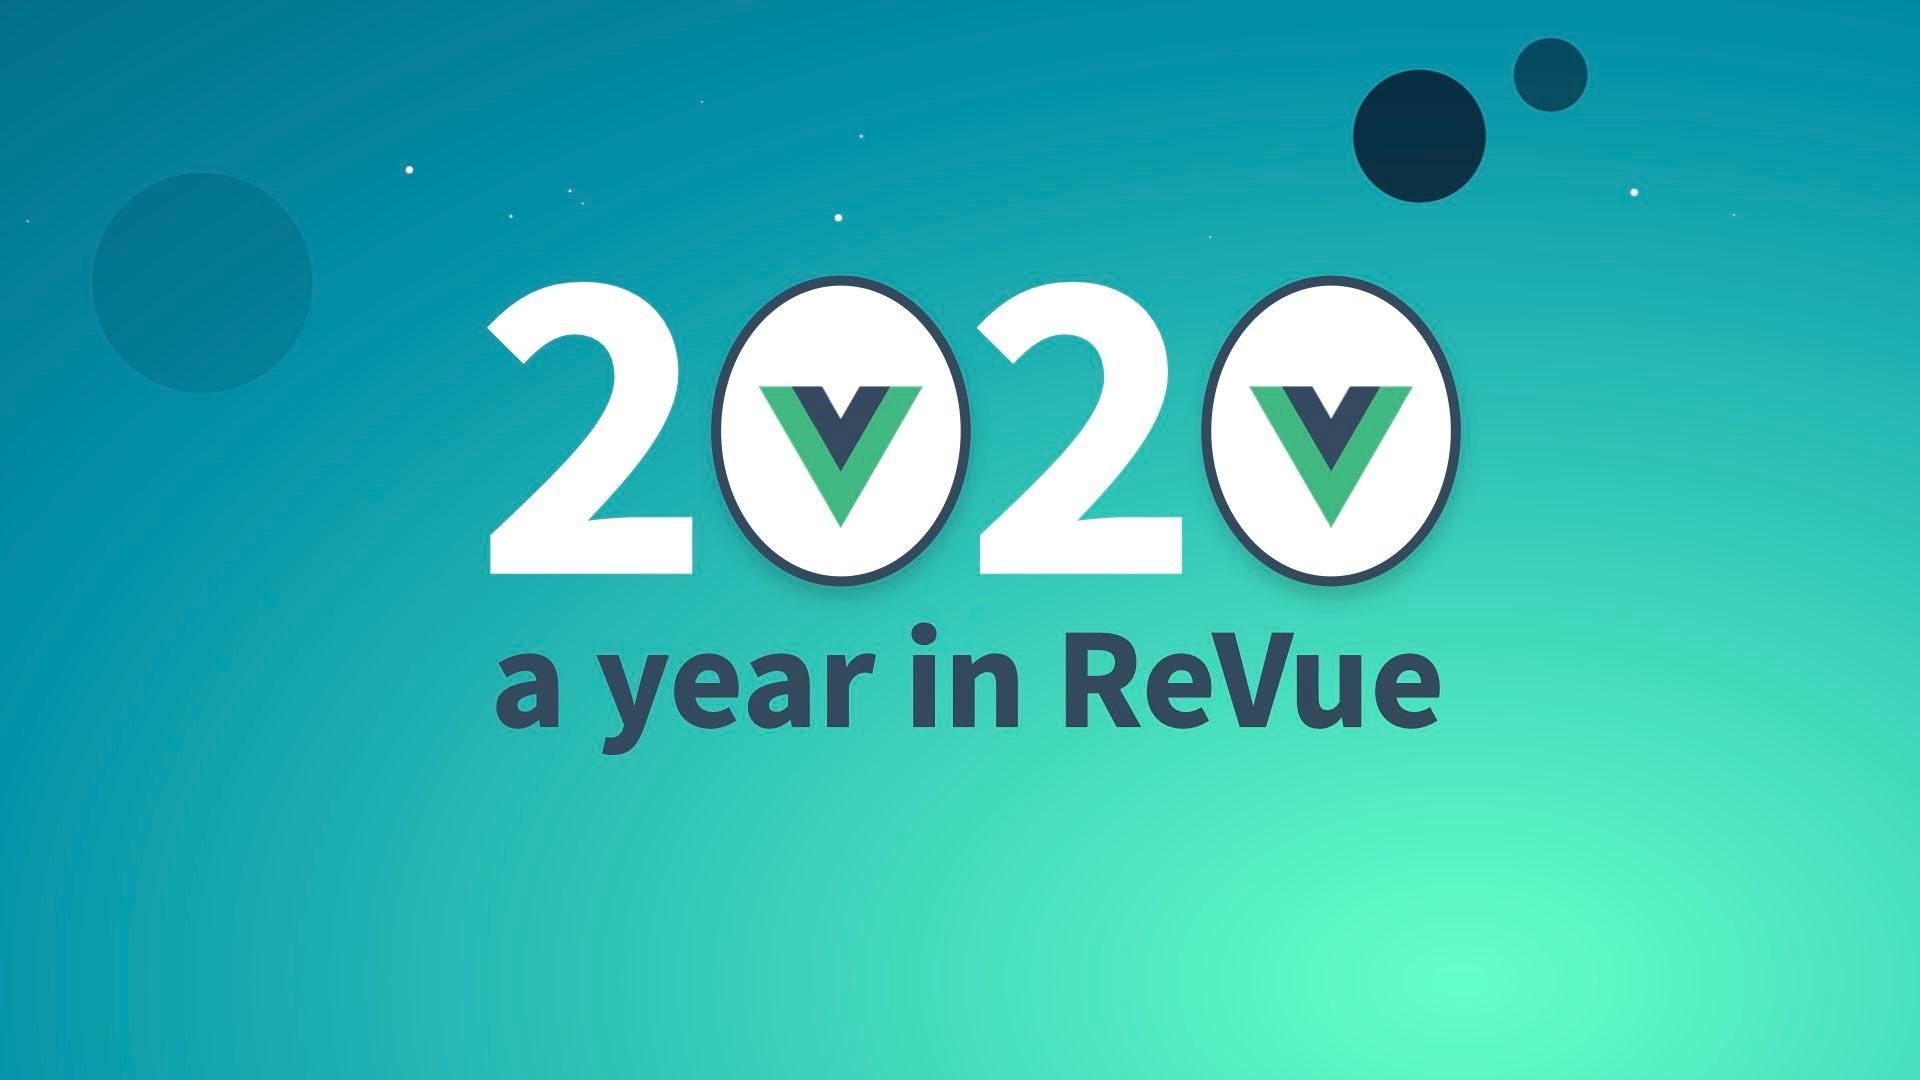 Where will Vue go in 2021?